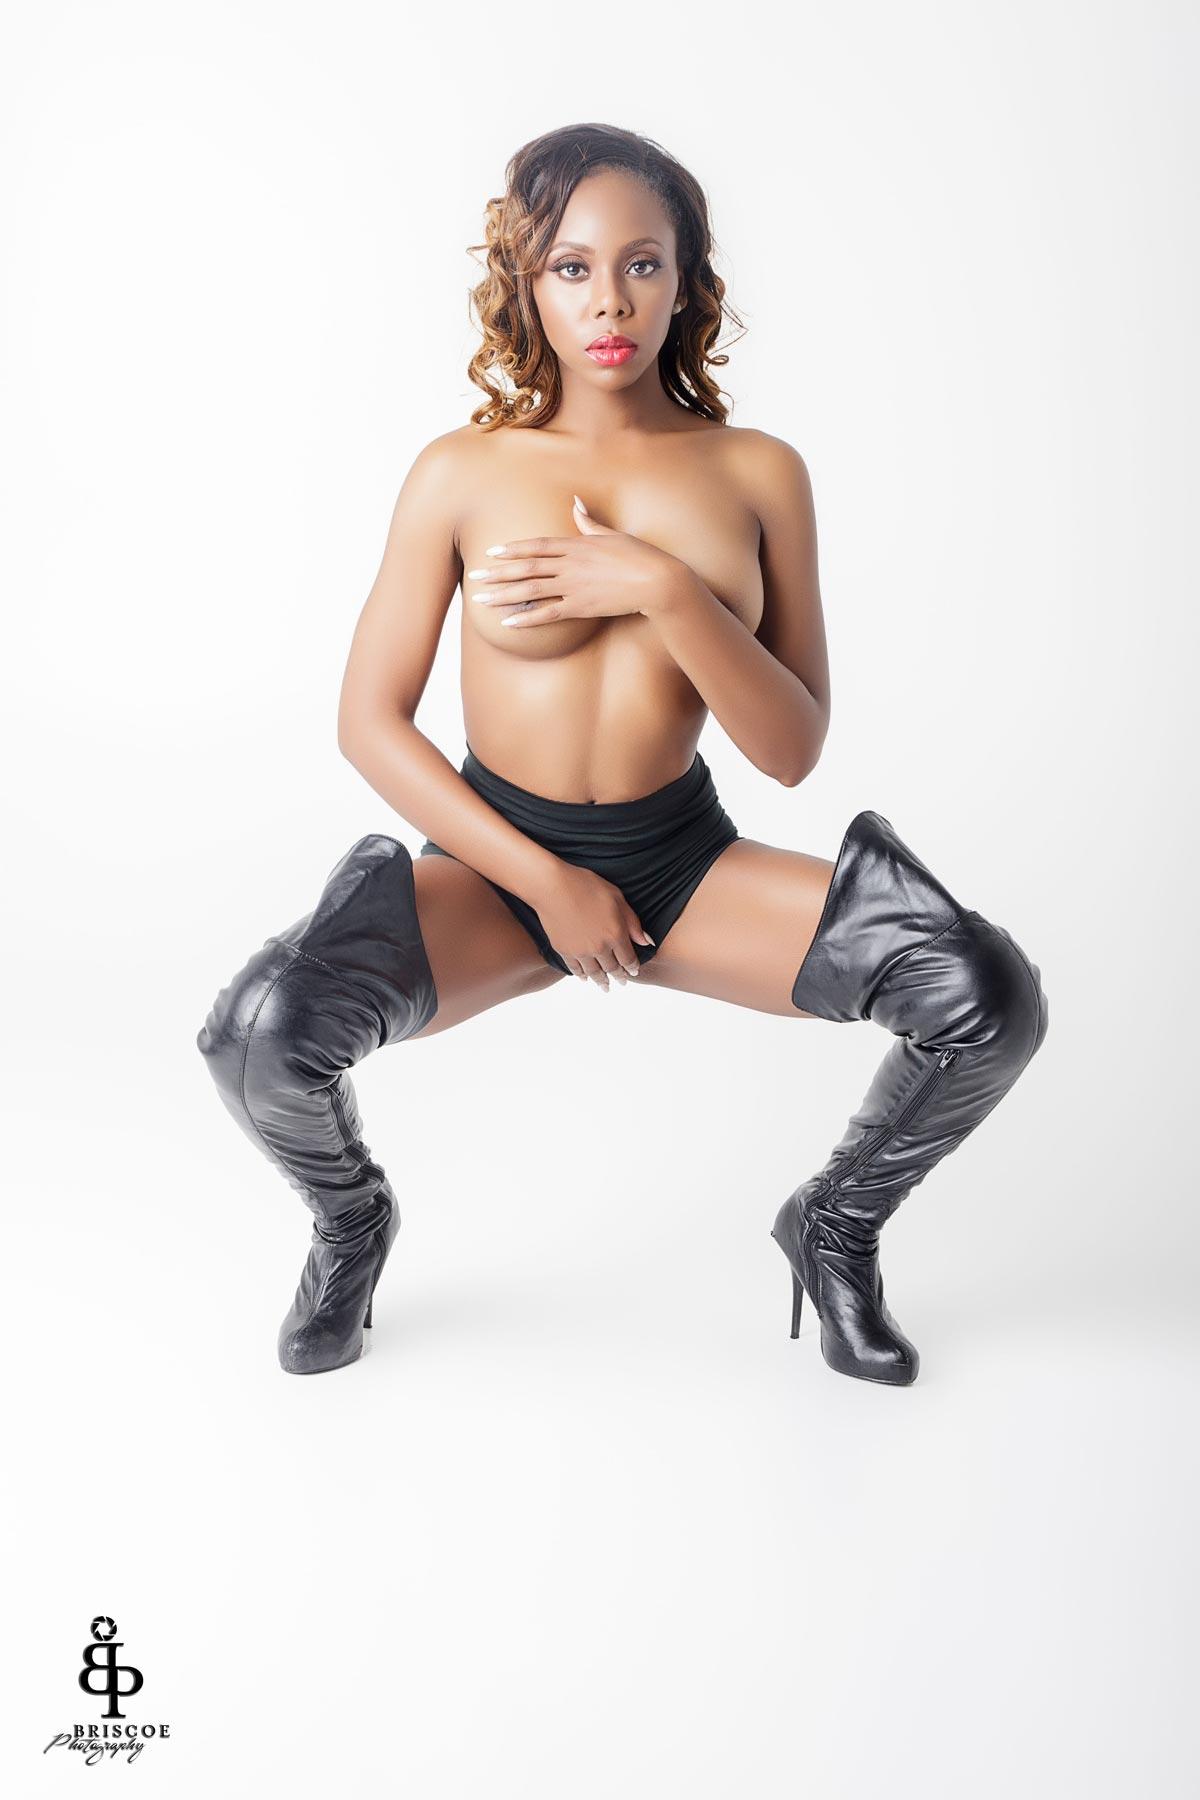 @Elle_Exotica-briscoe-dsad-10117